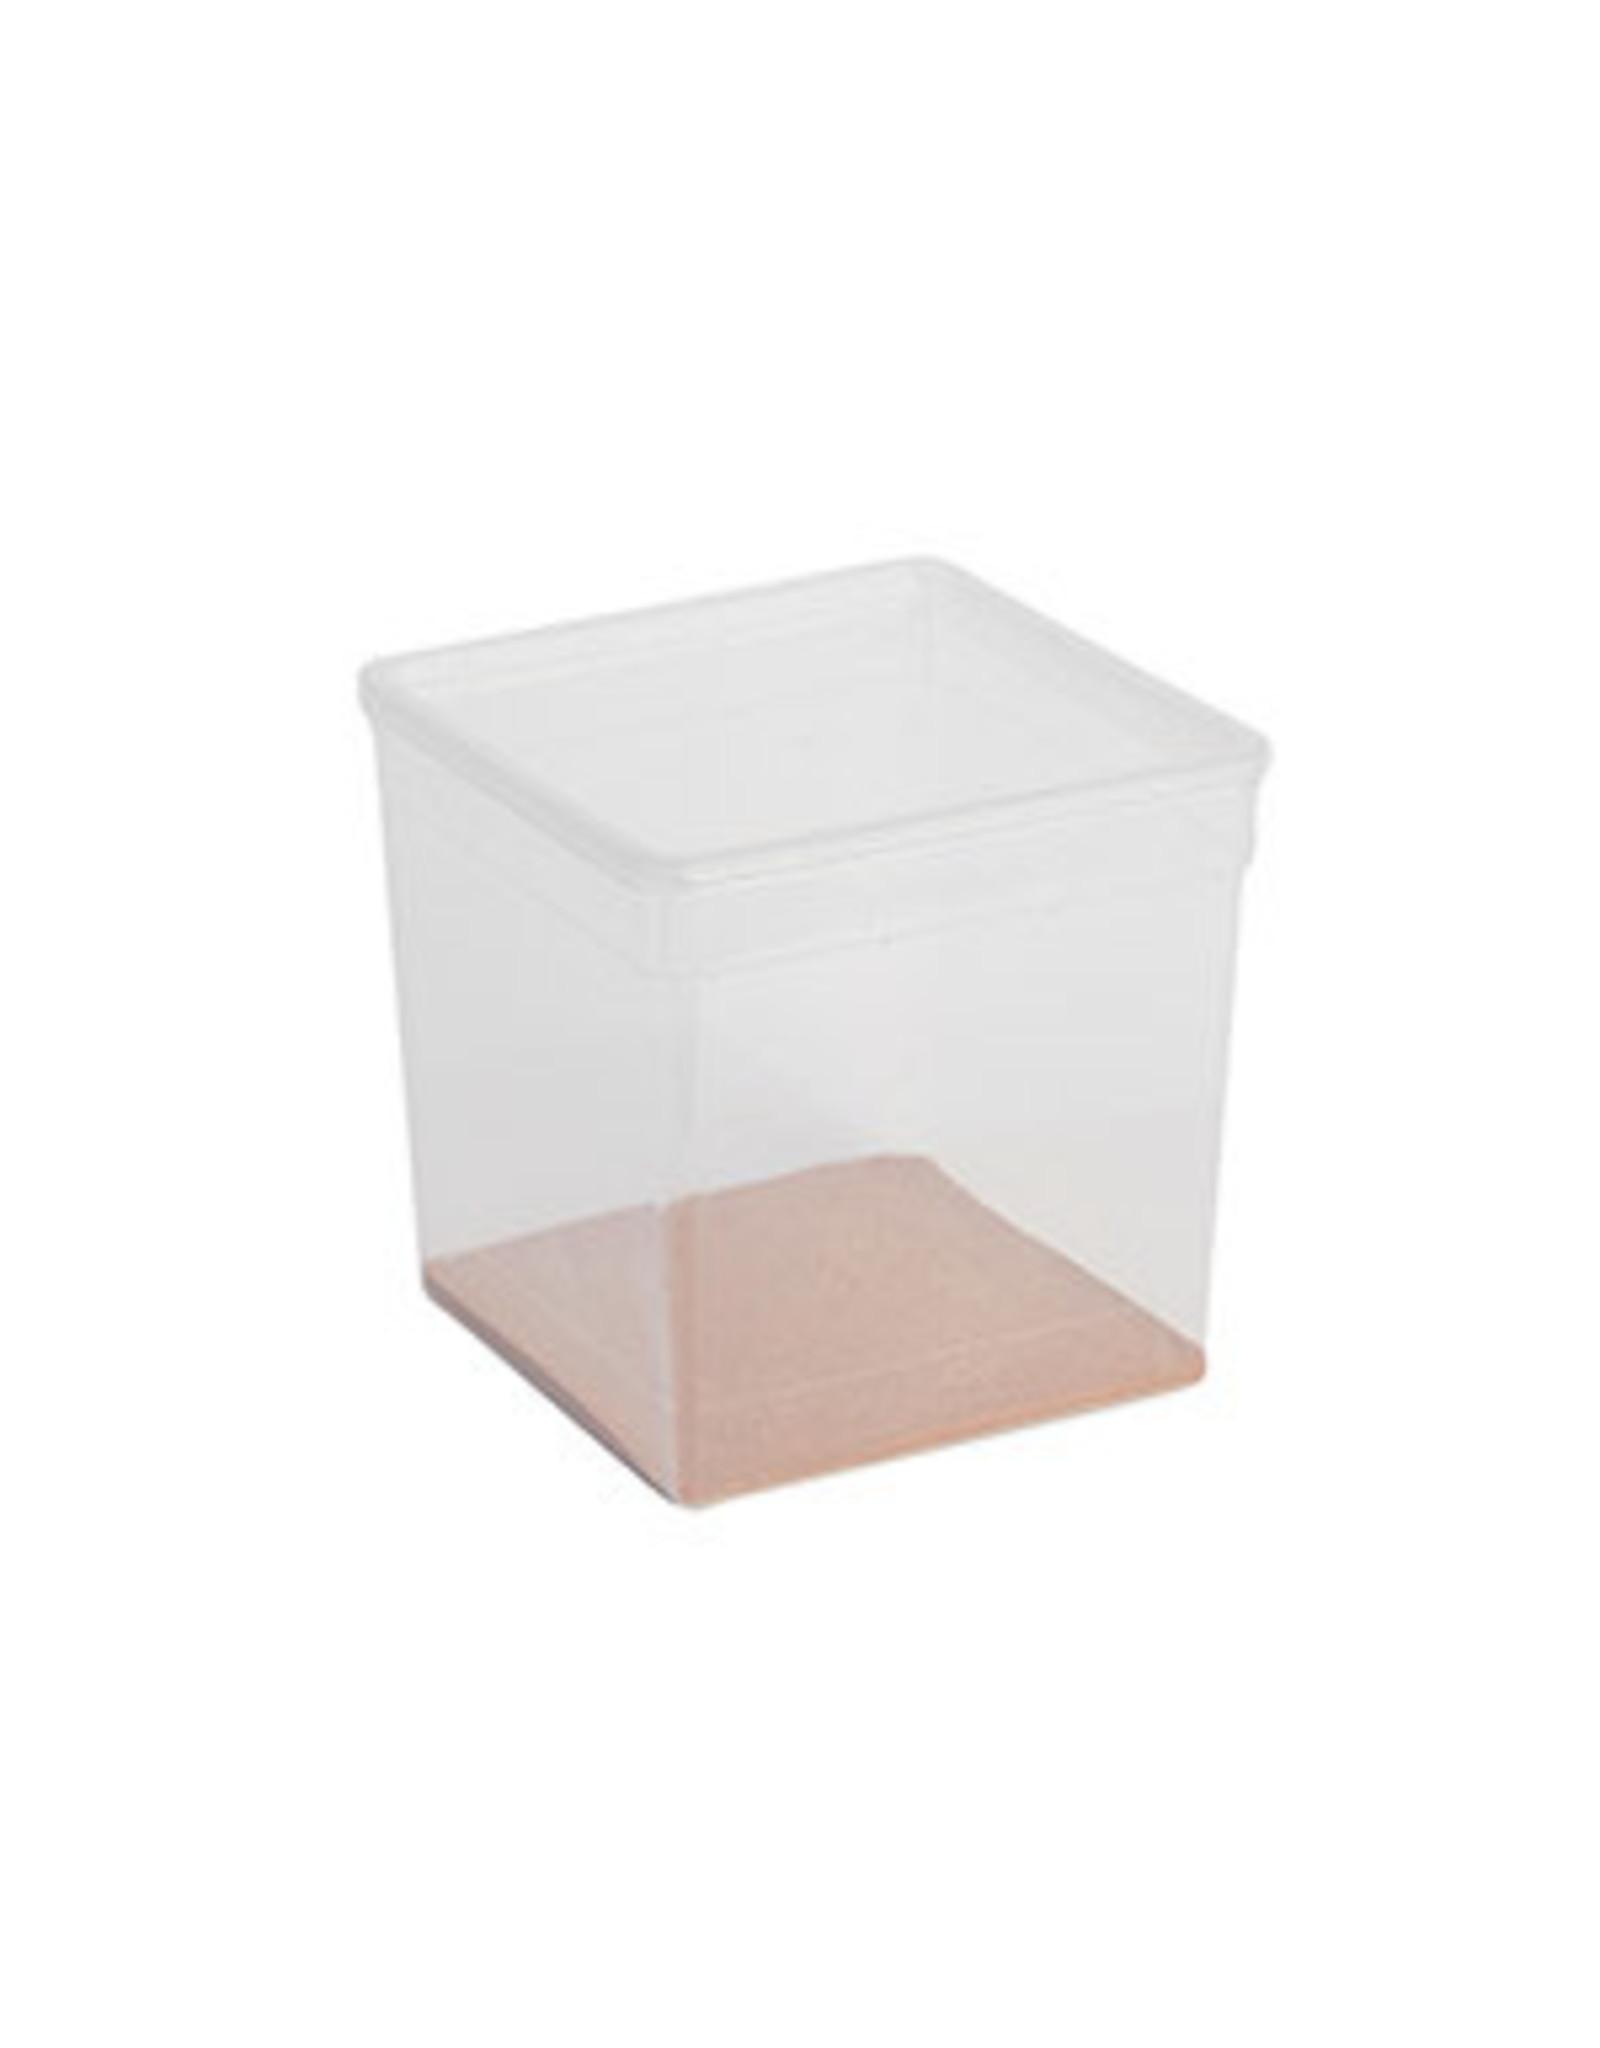 Braplast BraPlast Box & Lid 5.8L